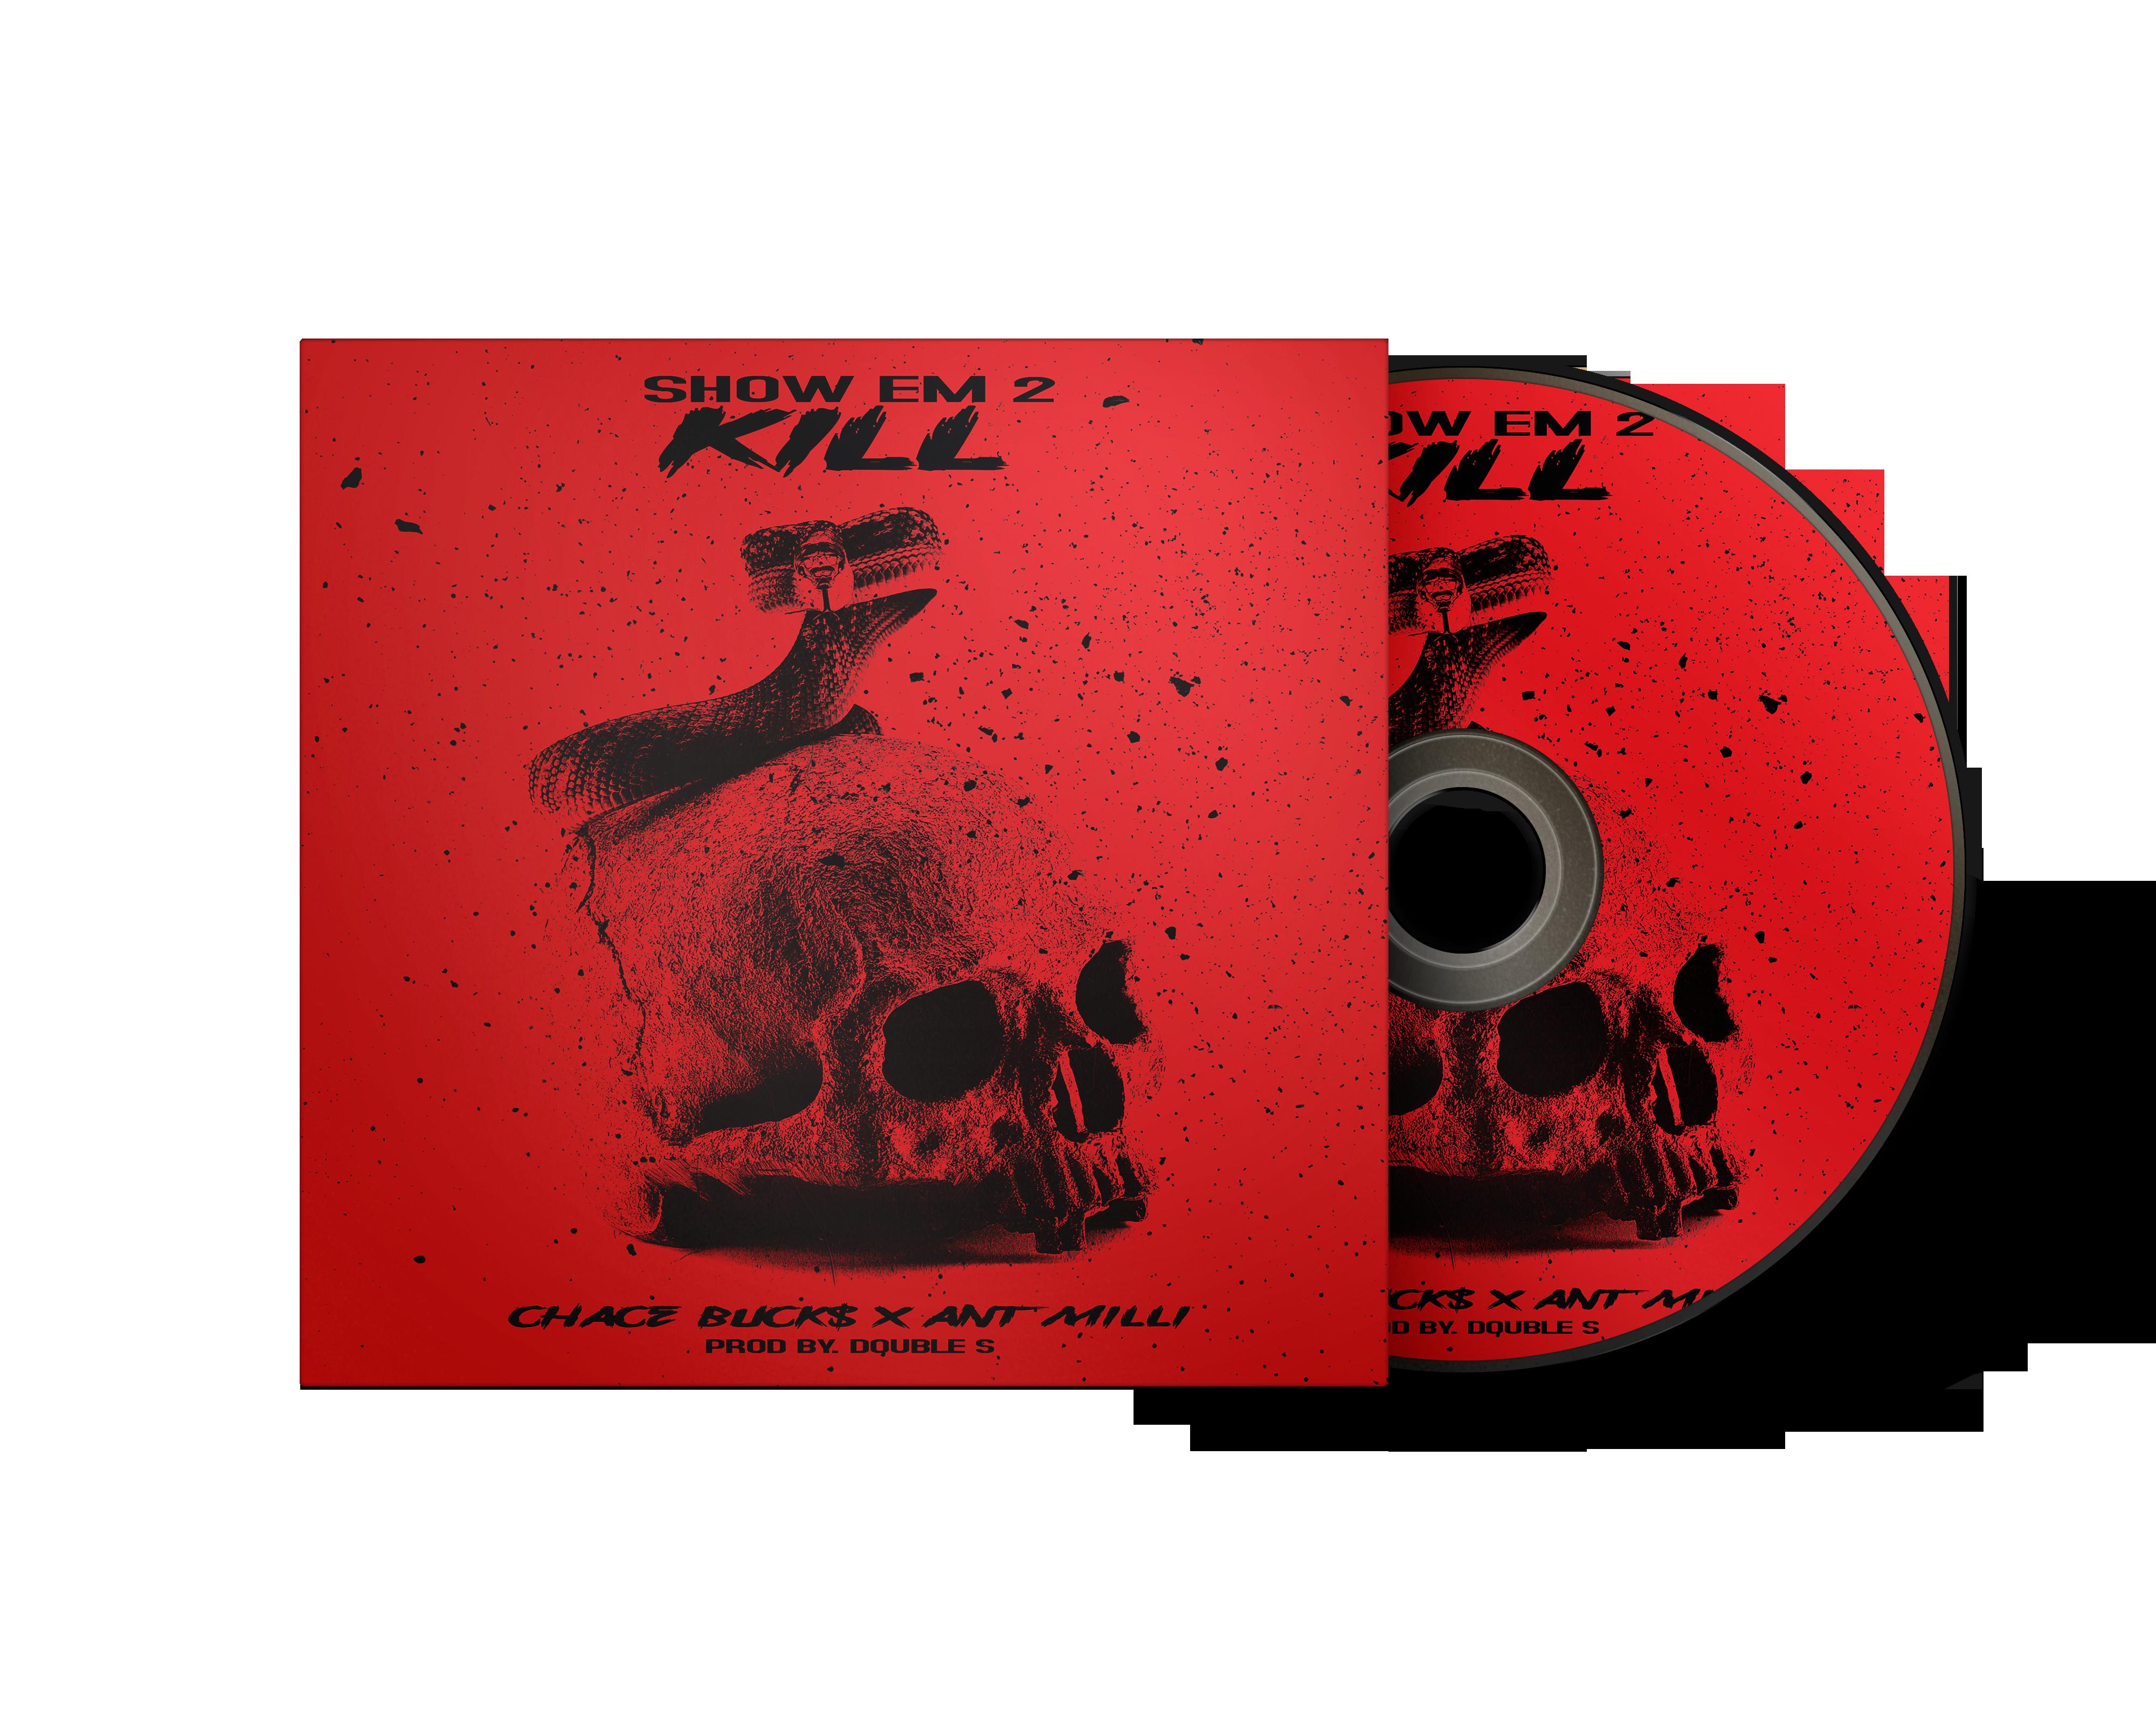 Chace Buck$ - Show em 2 kill